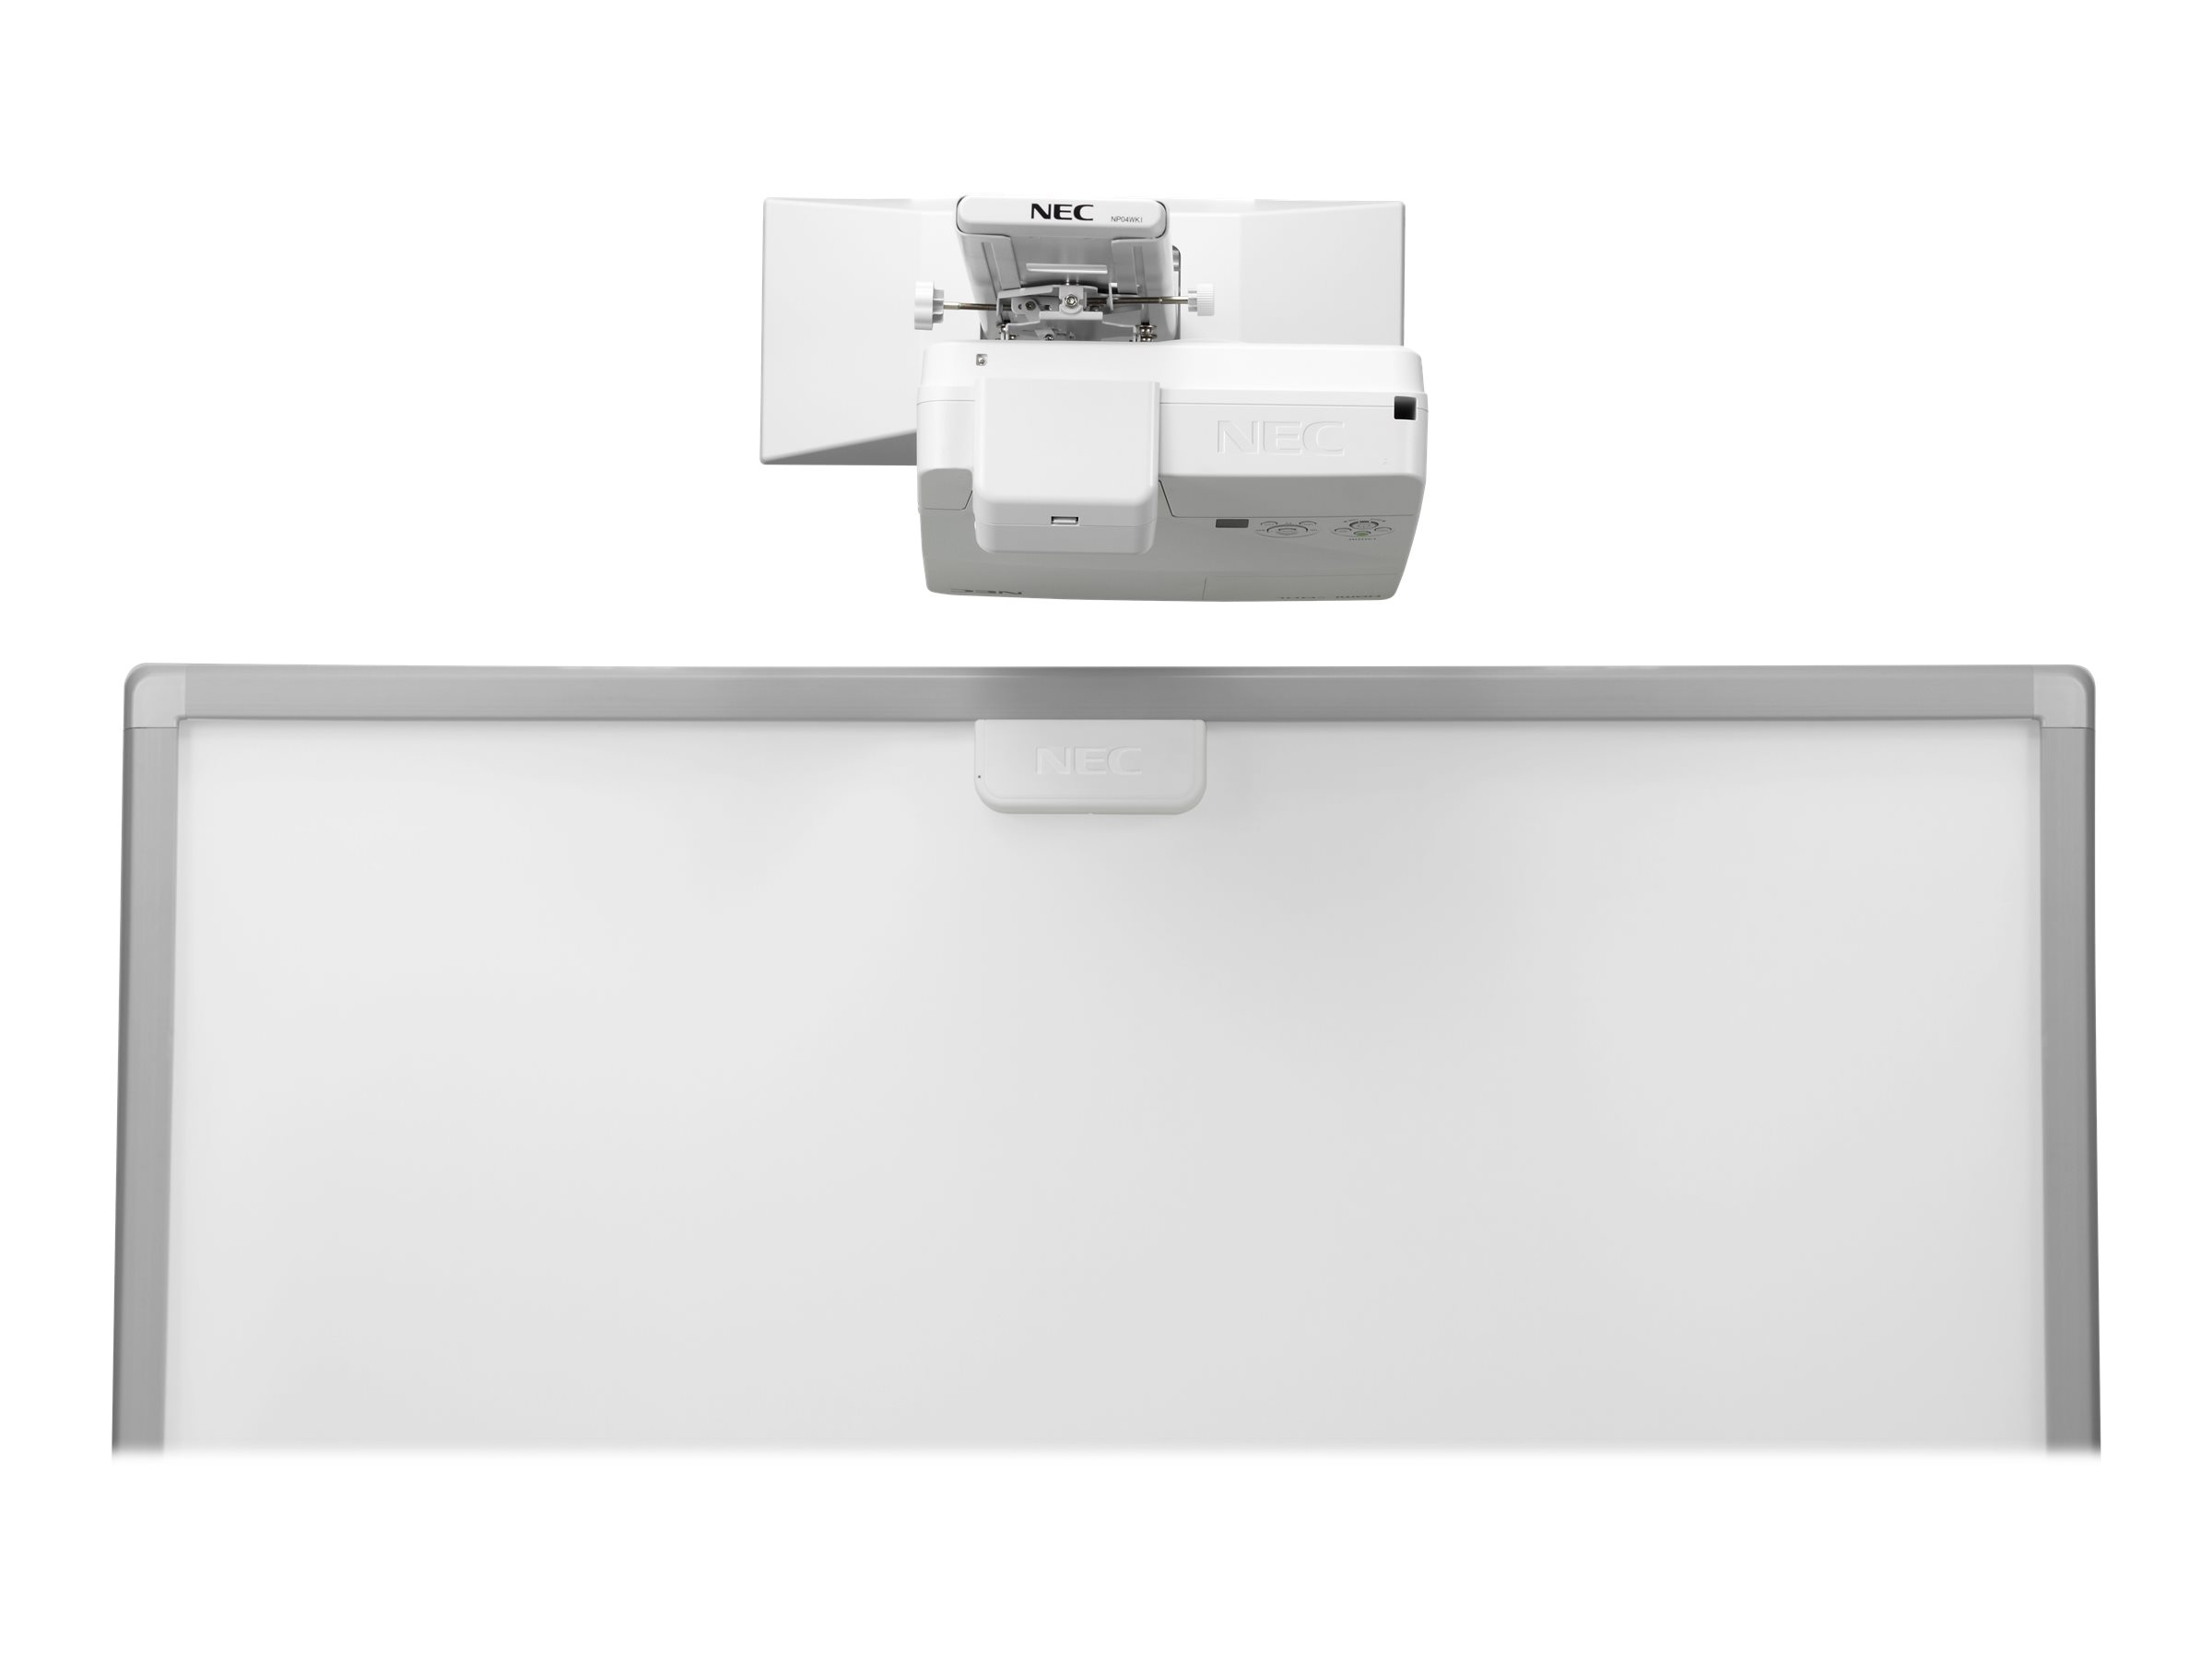 NEC UM301Wi Interactive Whiteboard Kit - Interaktives Whiteboard mit Projektor